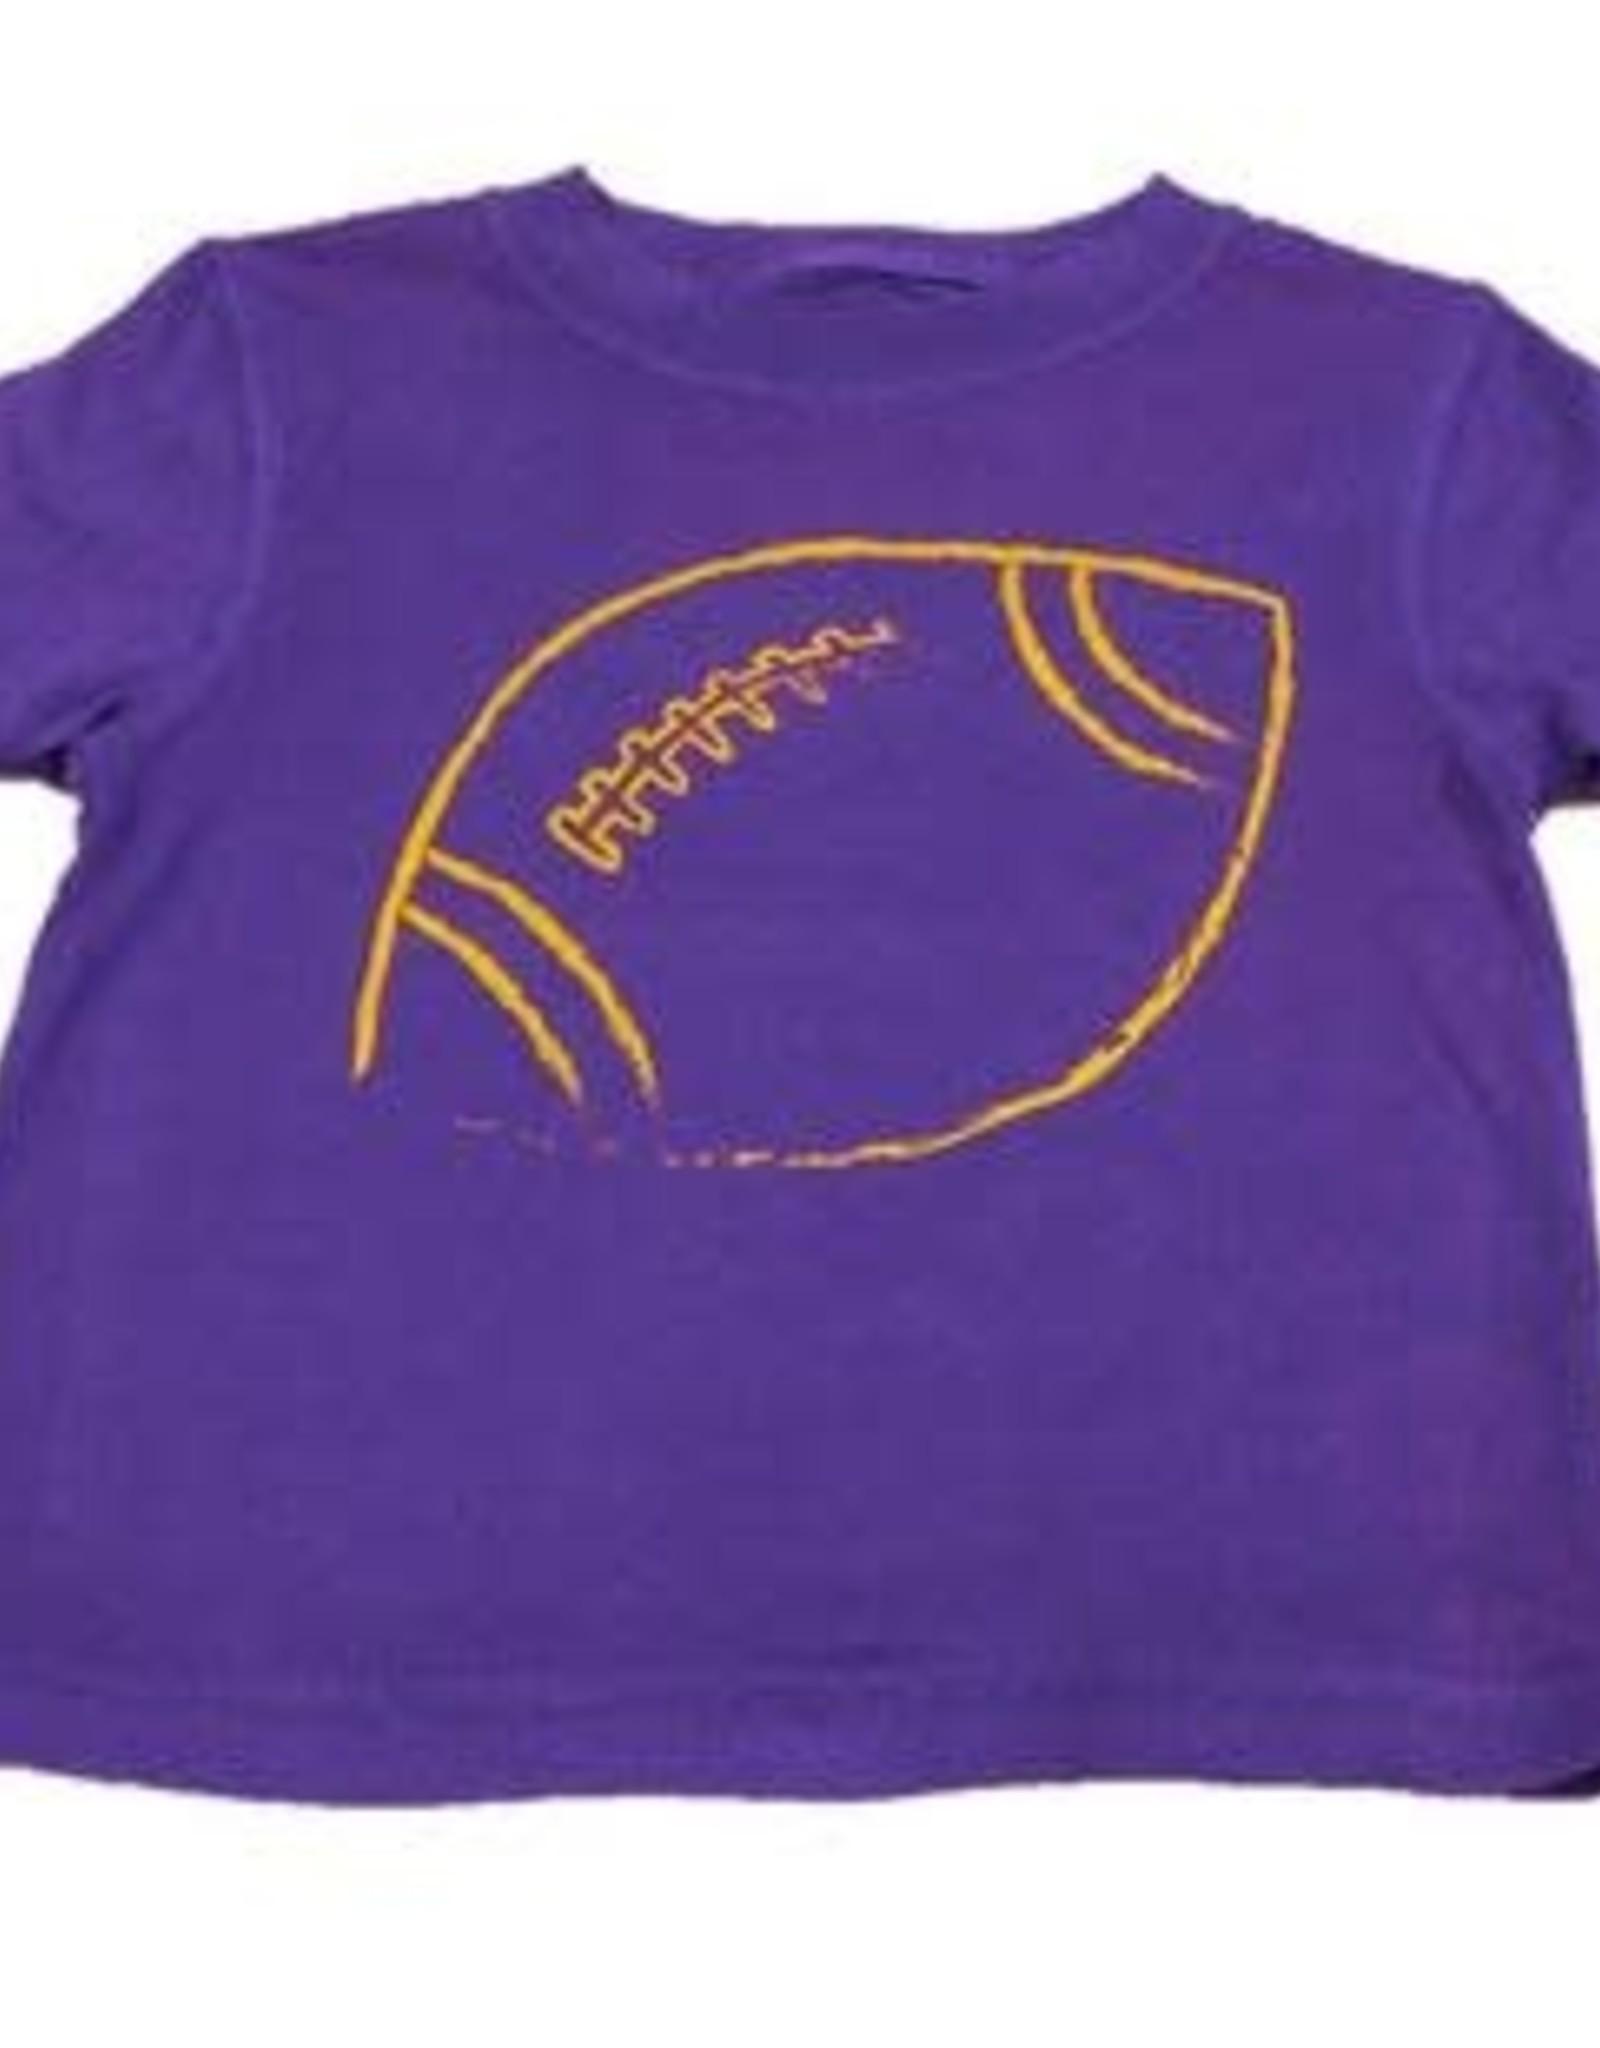 Mustard & ketchup Purple Football